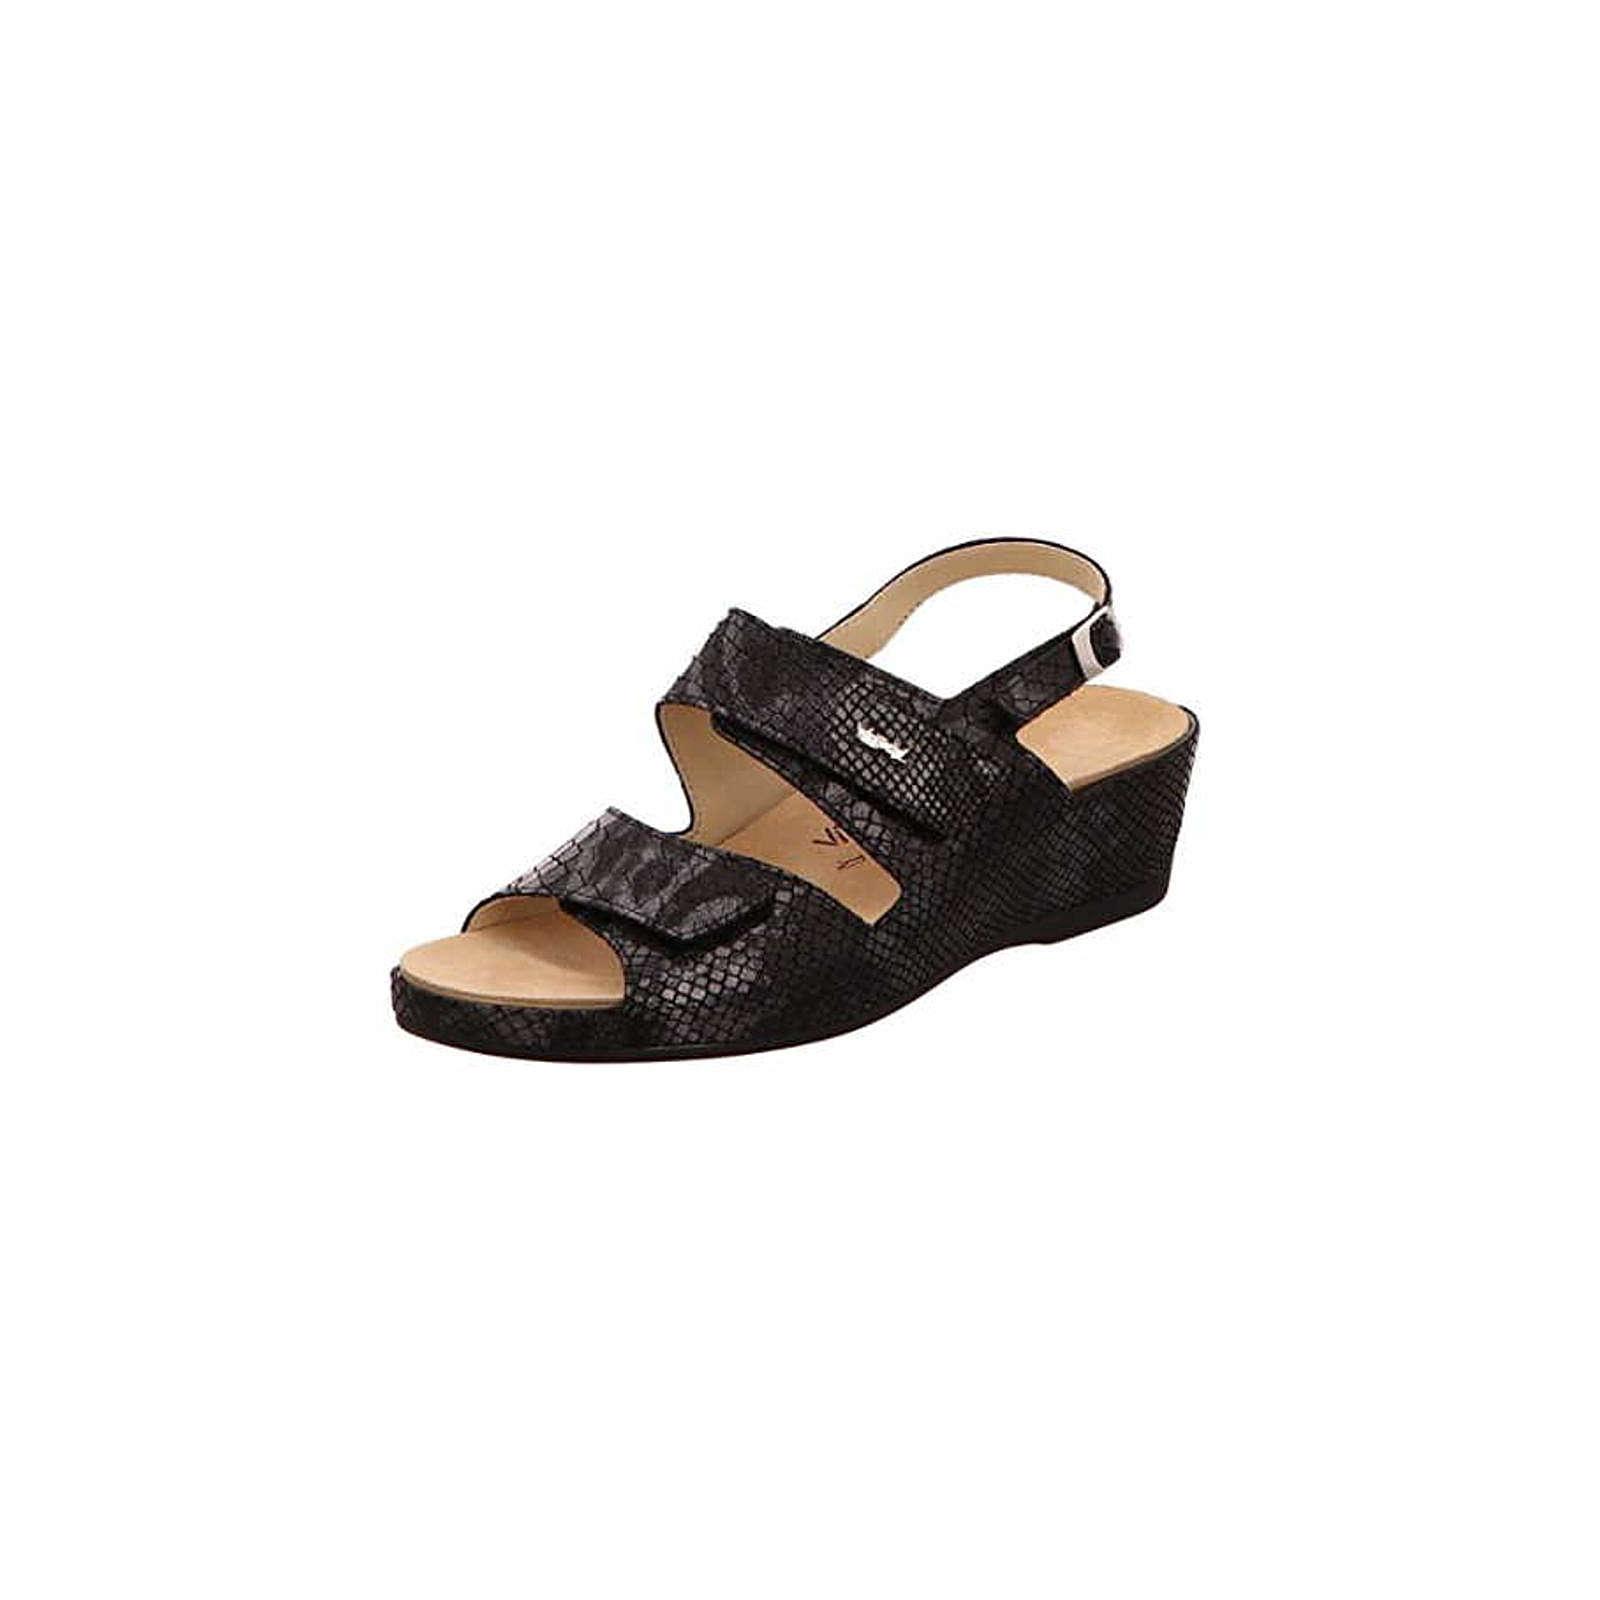 Vital Sandalen/Sandaletten schwarz schwarz Damen Gr. 37